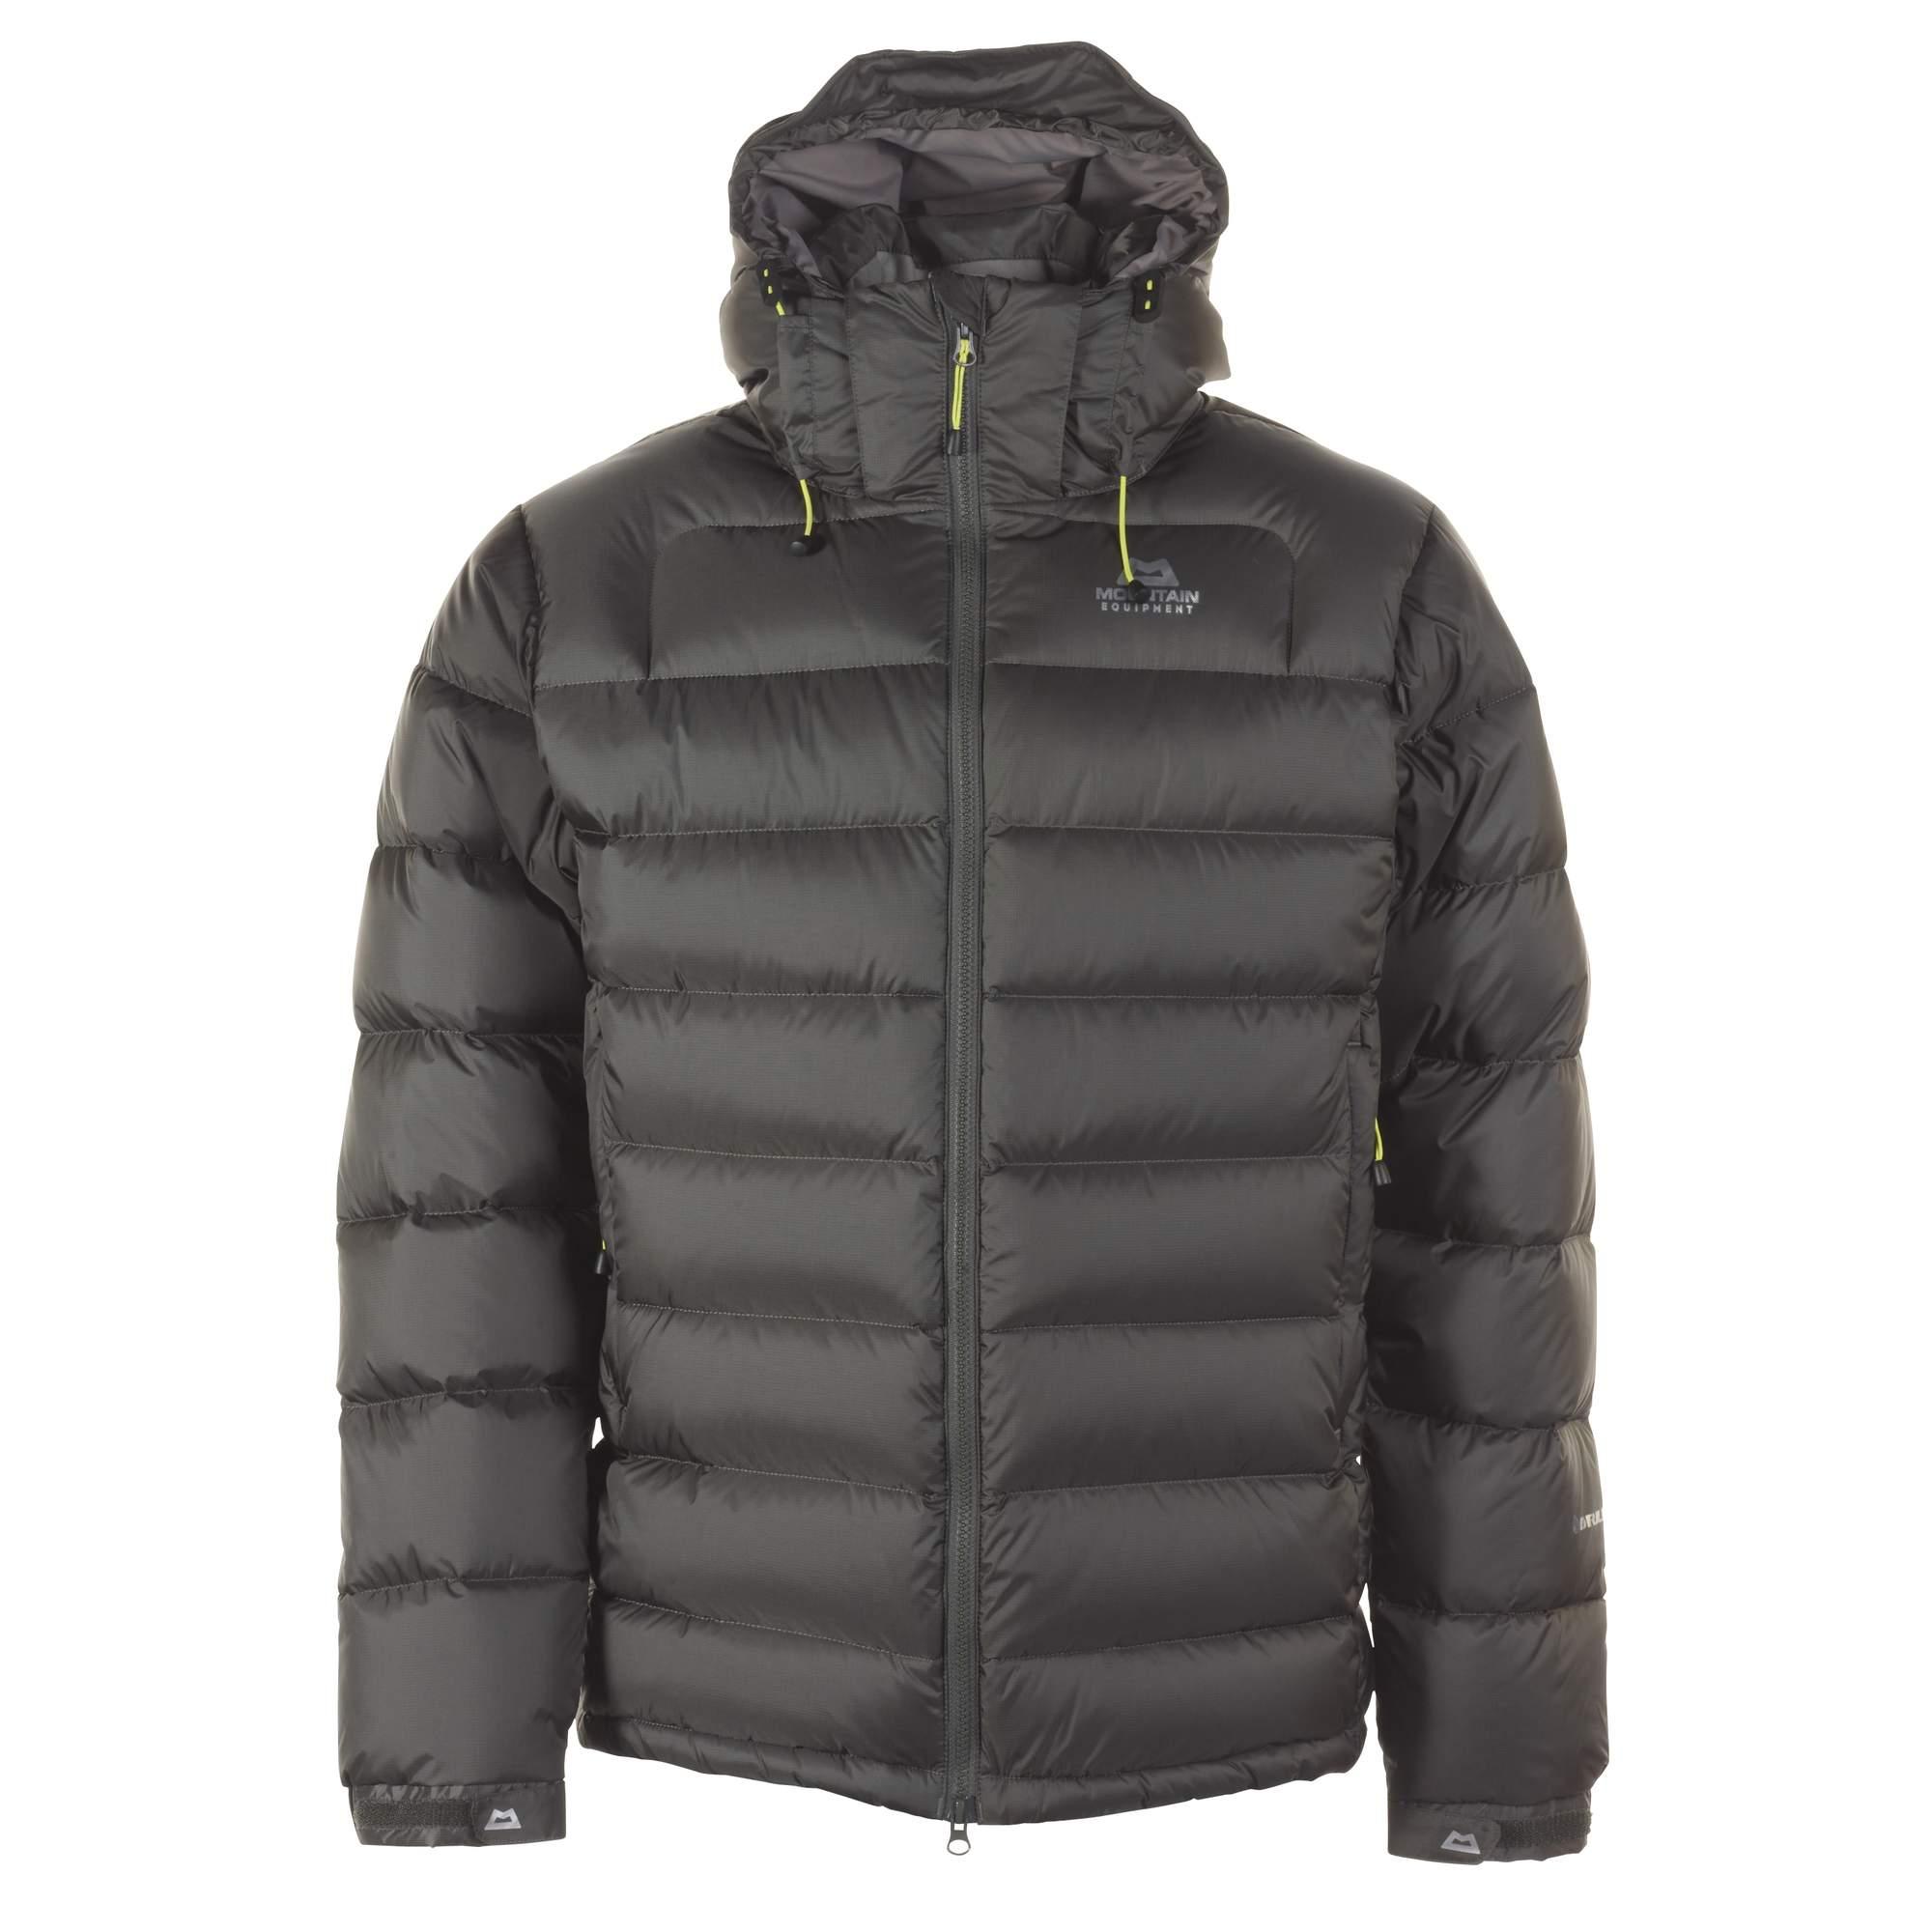 Mountain Equipment Lightline Jacket Herren Gr. XXL - grau|schwarz / shadow grey ME-000148 ME-01011 SHADOW GREY